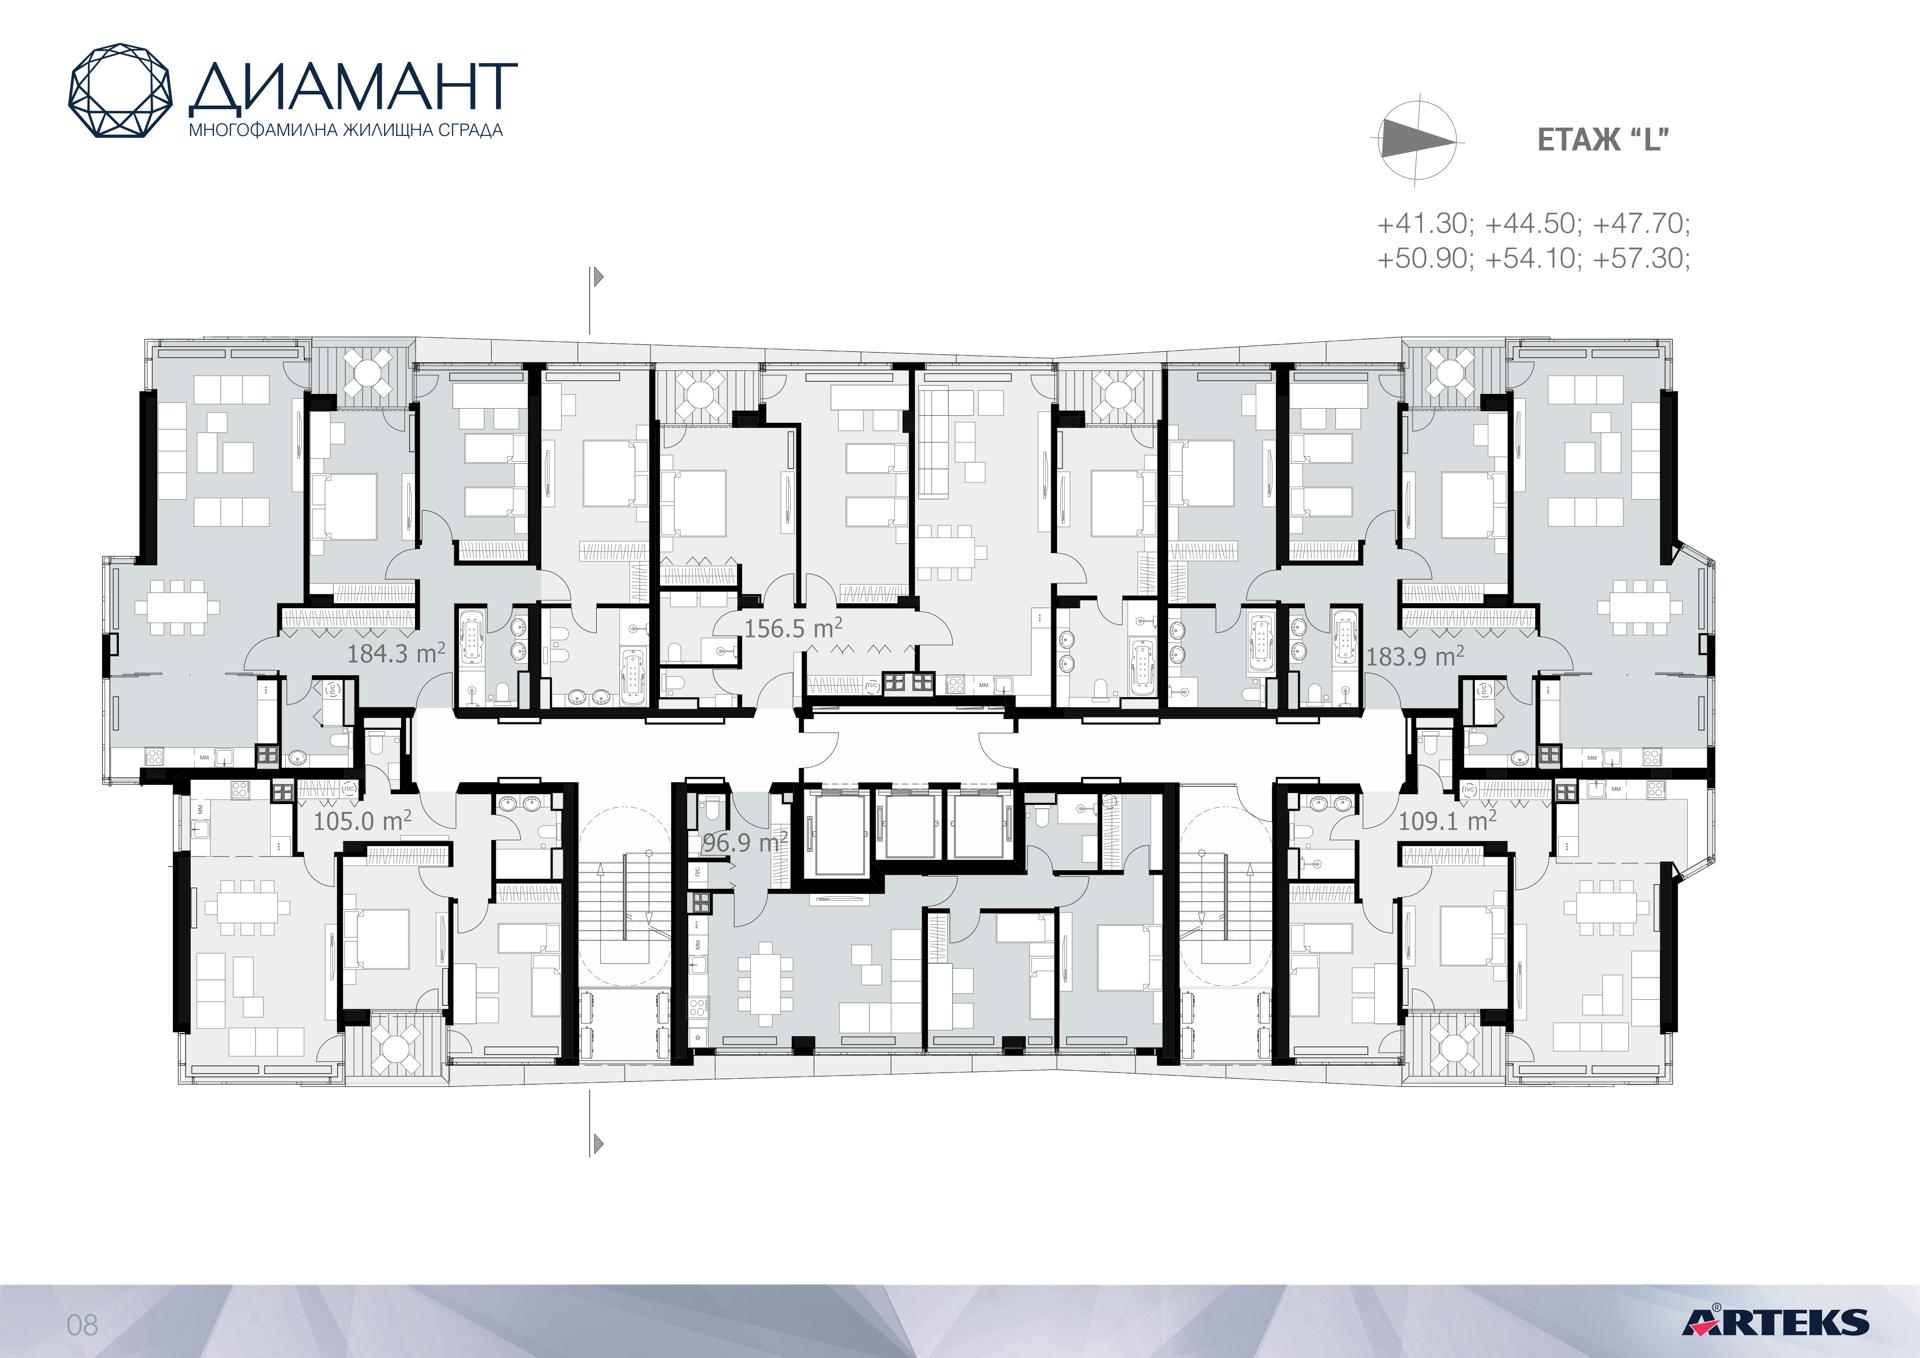 Arteks: Diamond, ein Luxushochhaus in Sofia